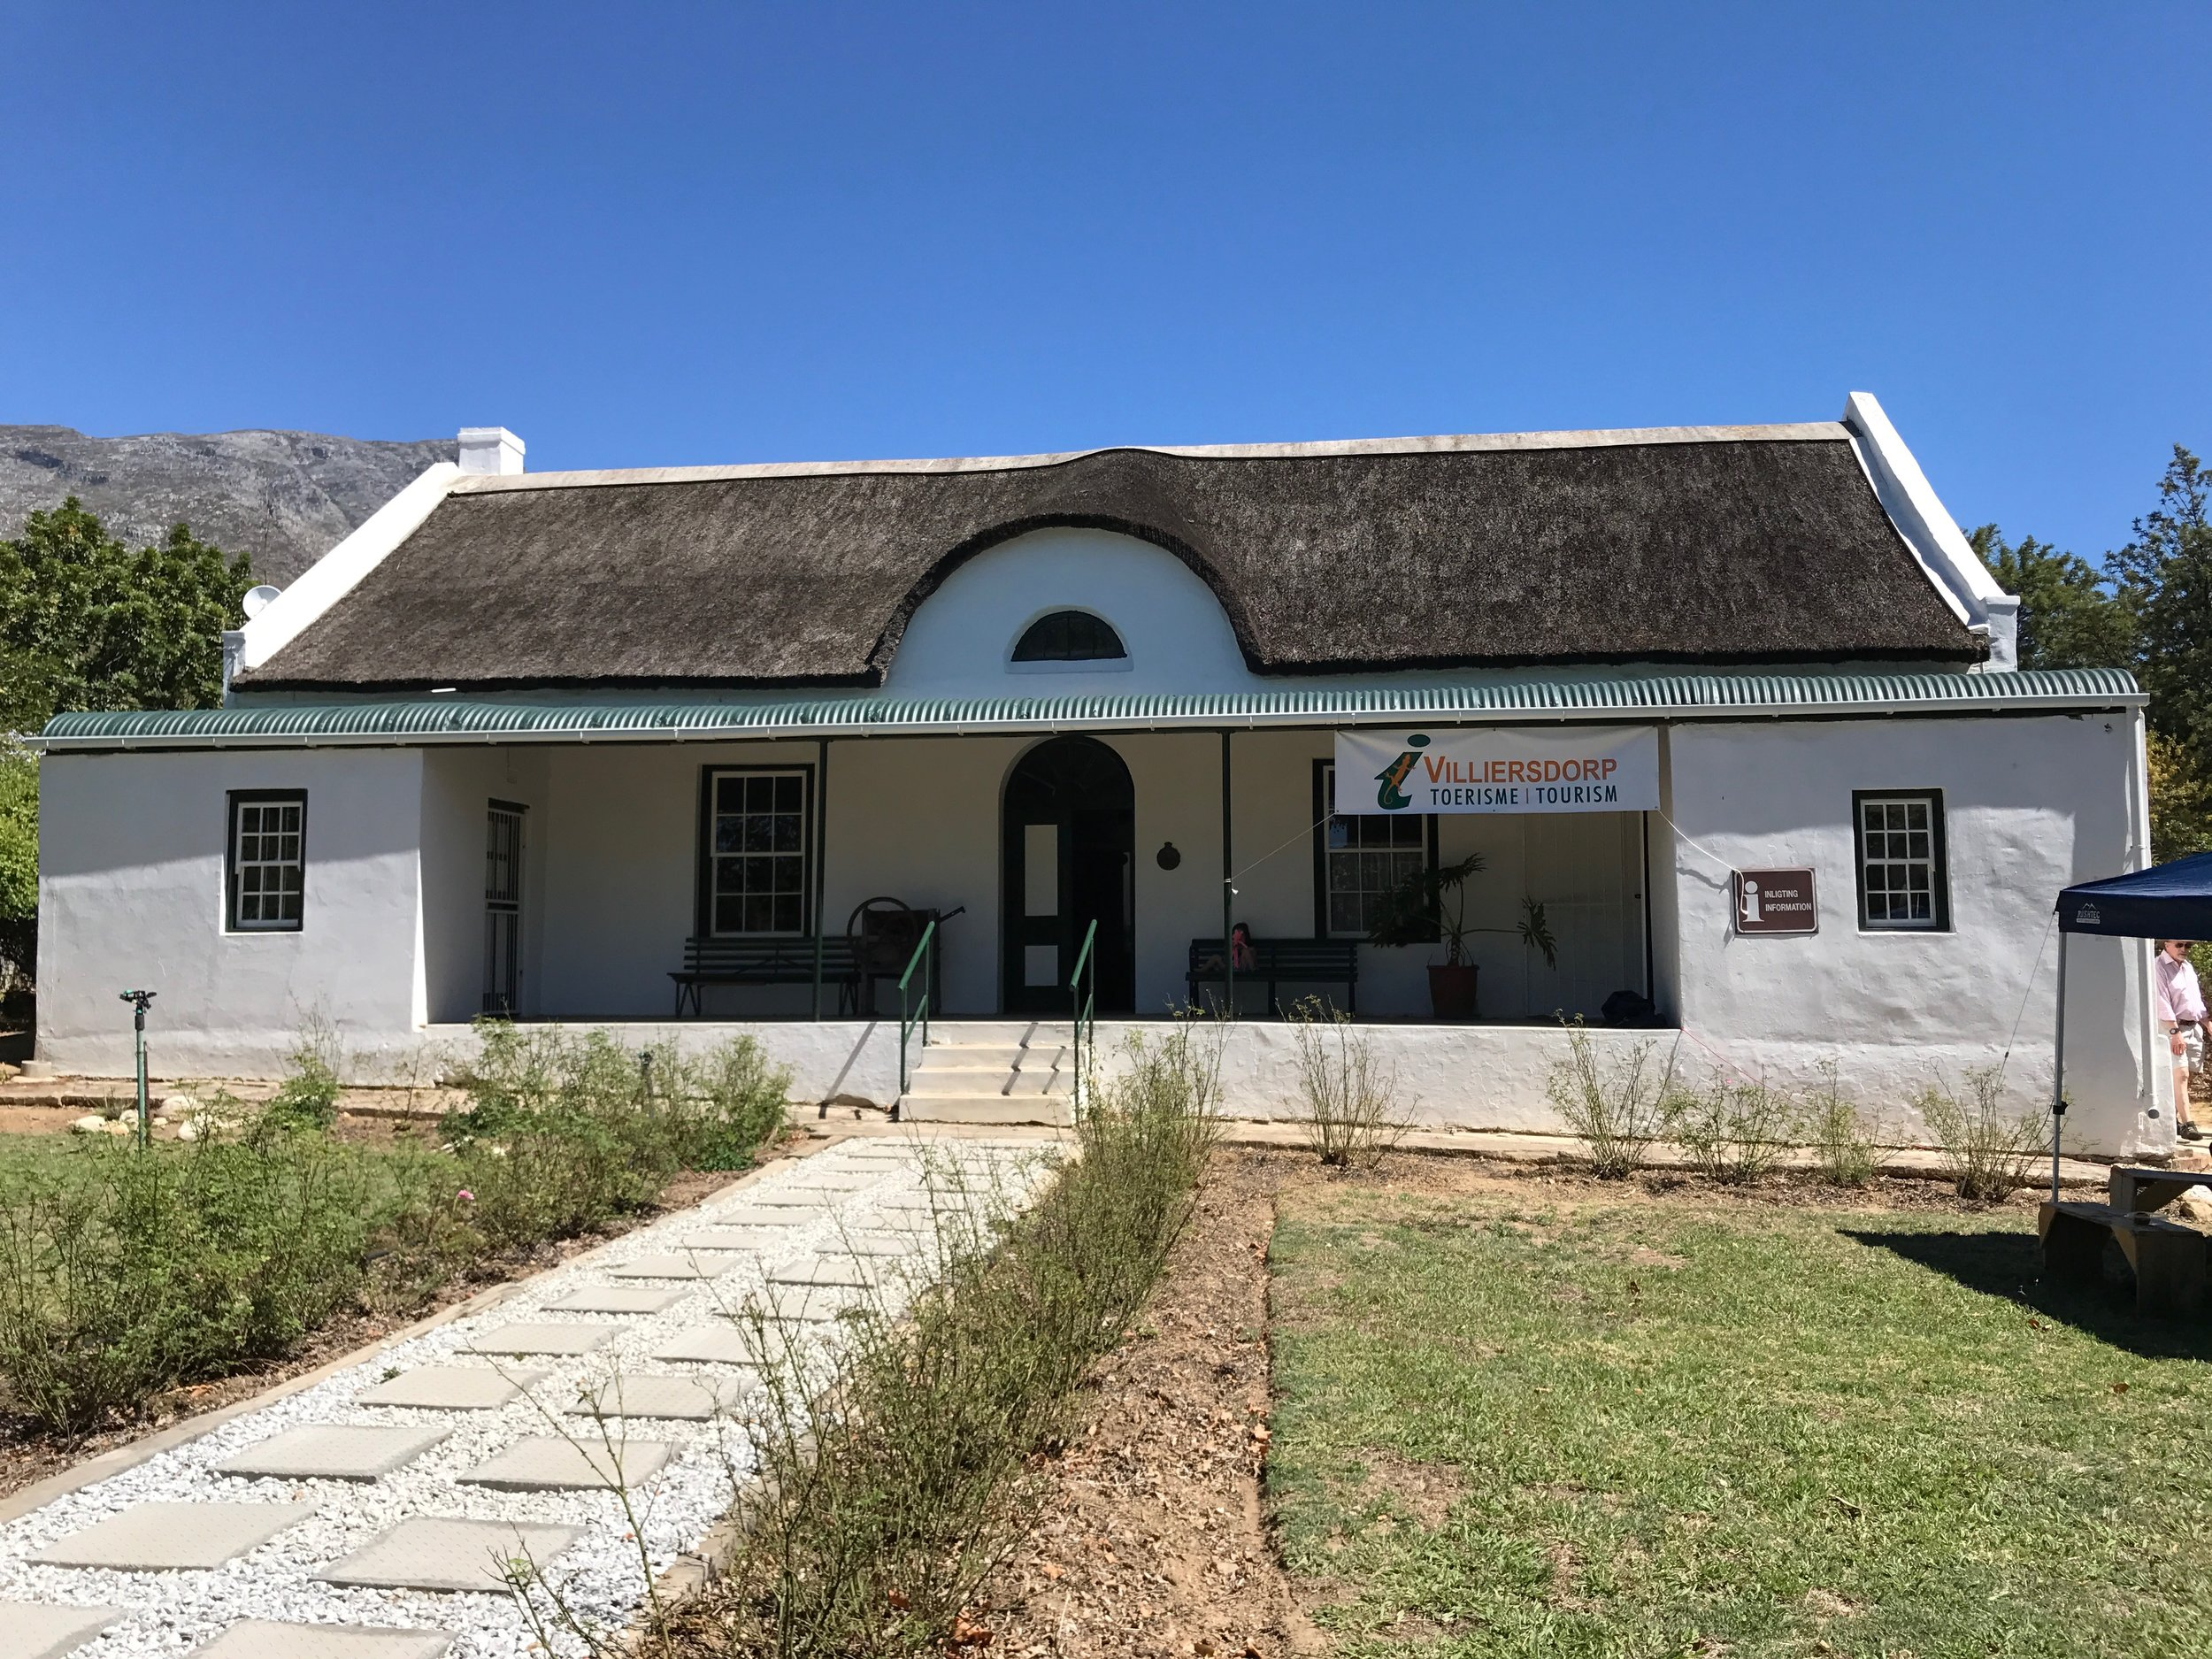 Villiersdorp Visitors Center